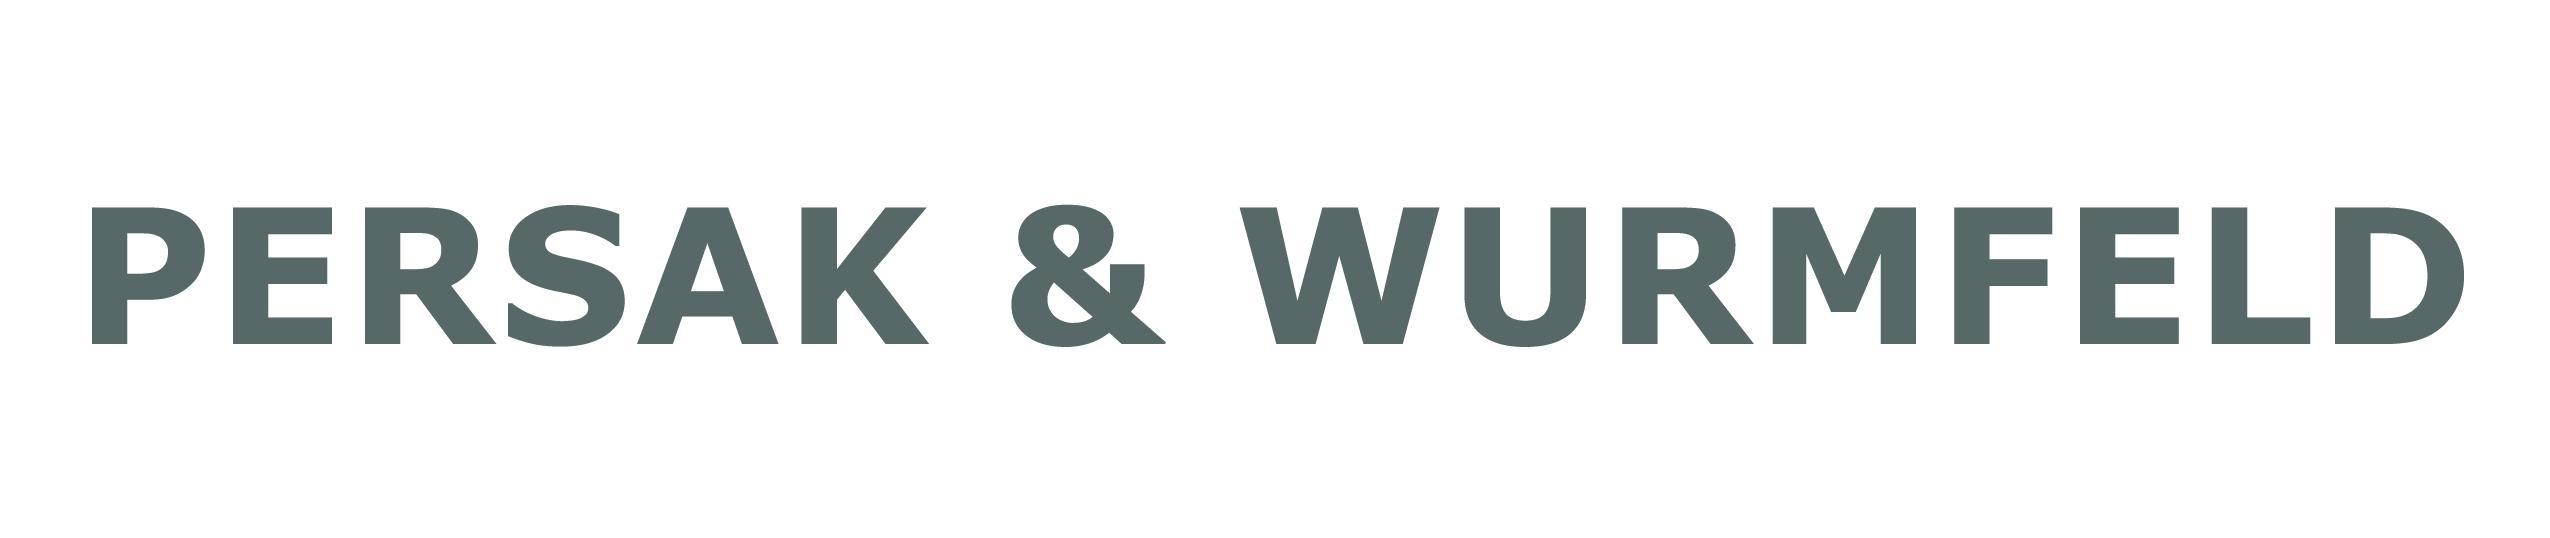 Persak & Wurmfeld